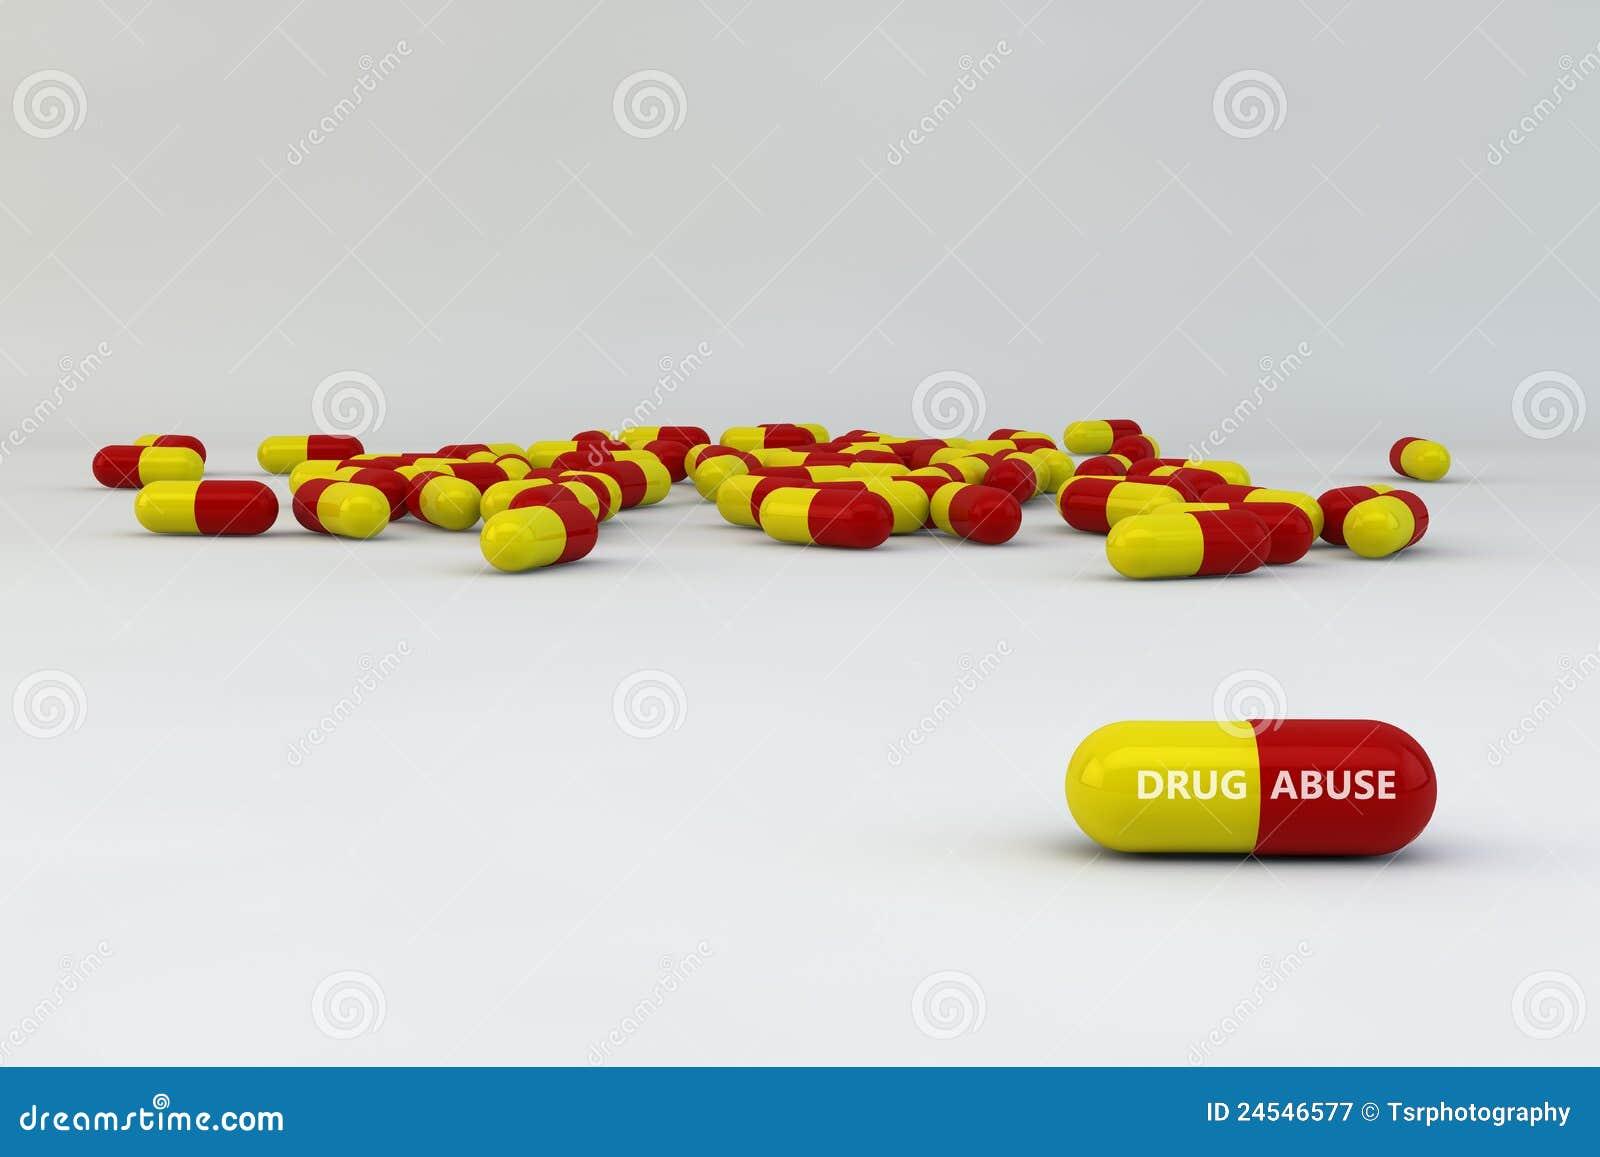 z drug addiction